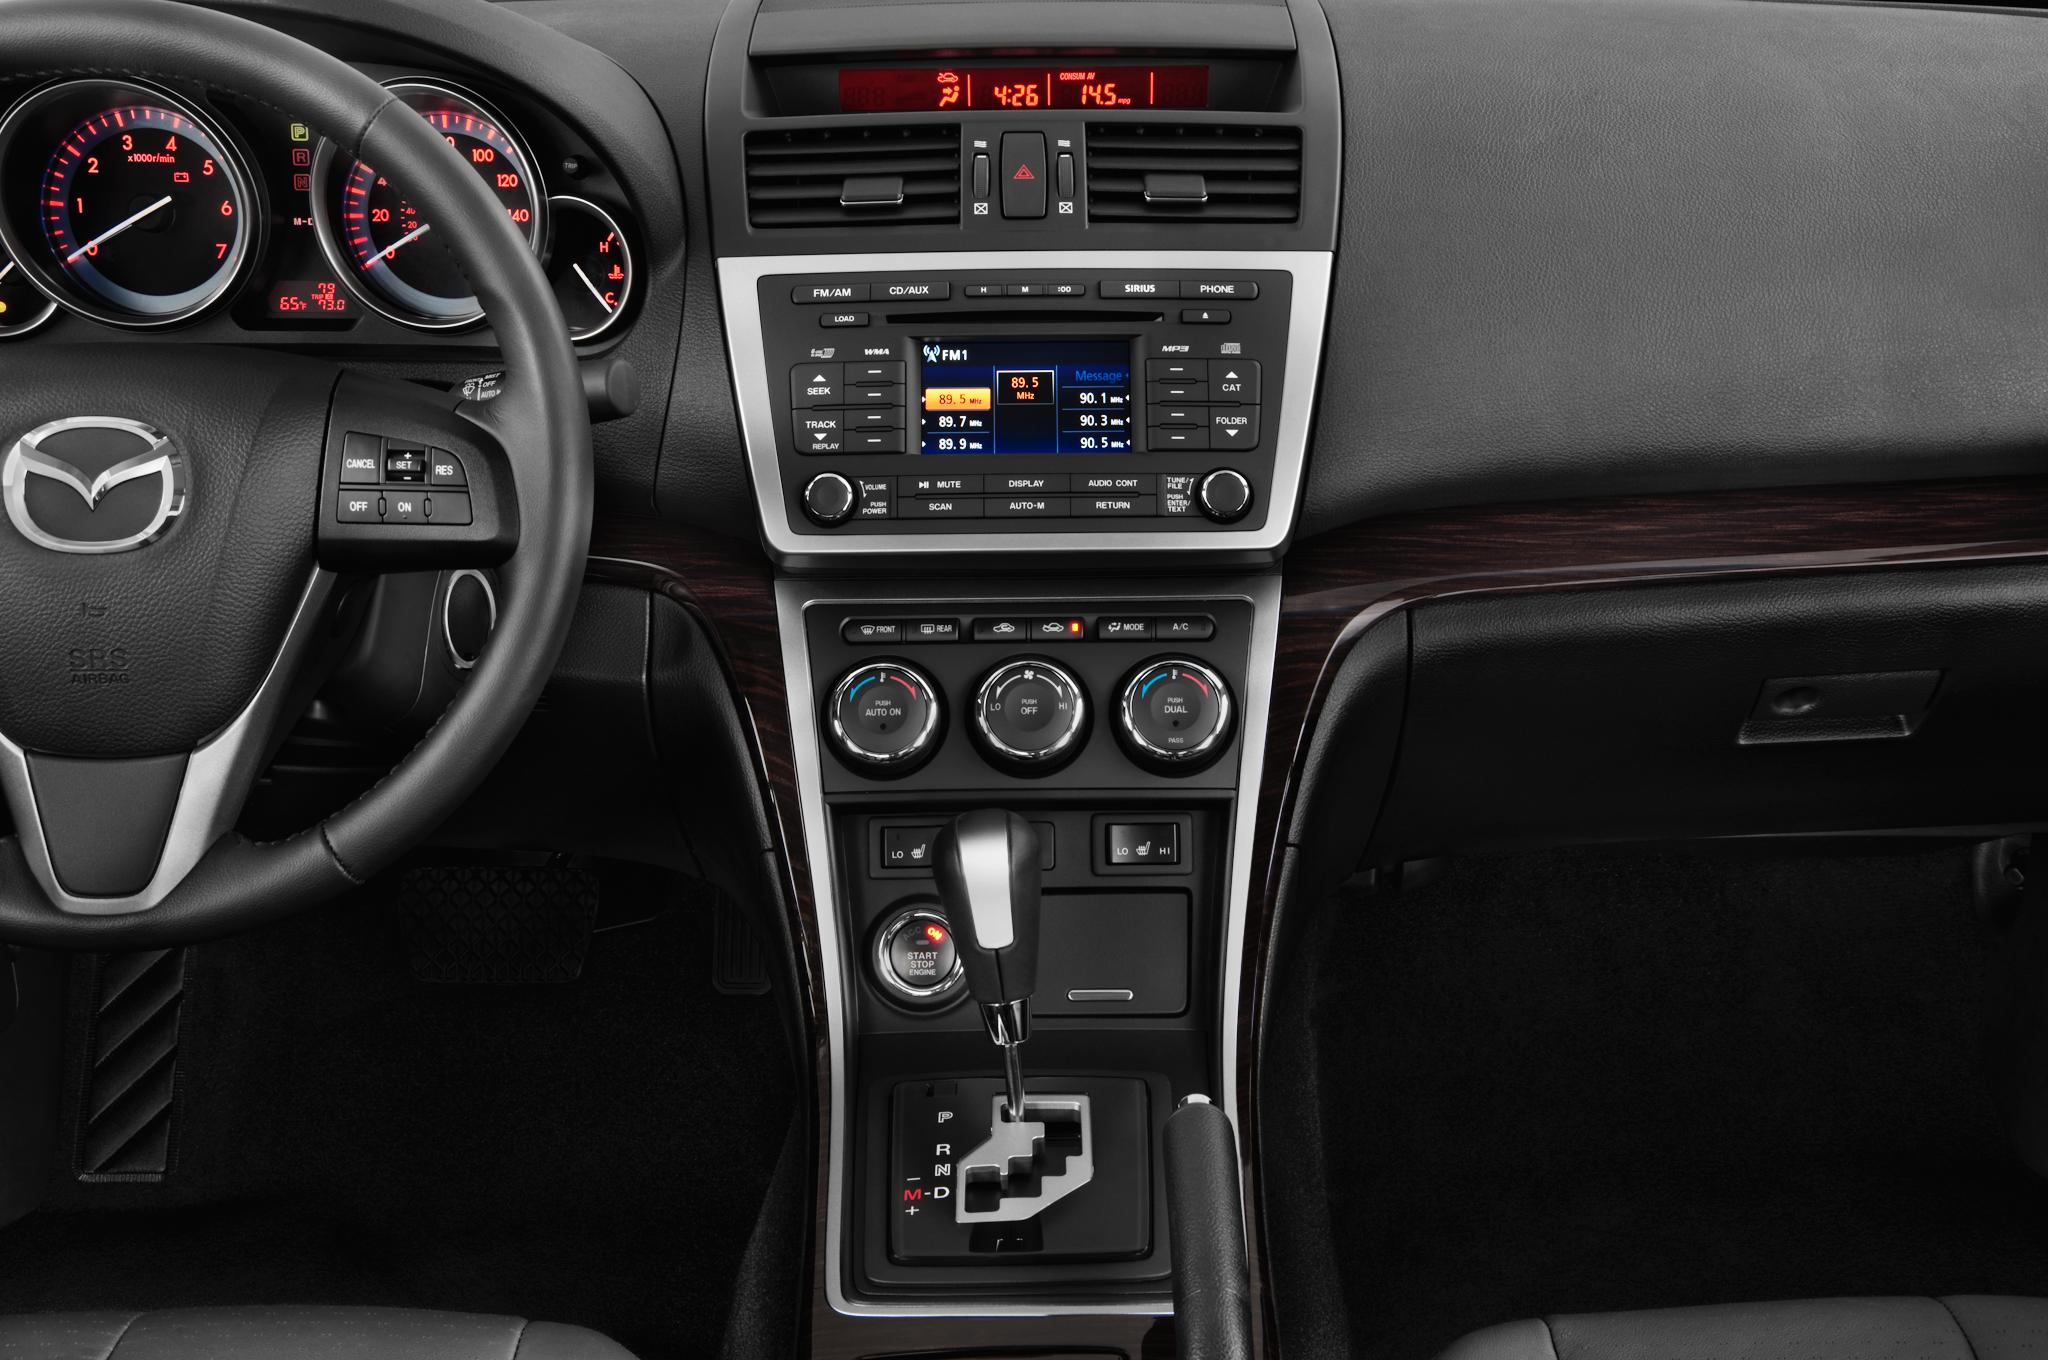 http://st.automobilemag.com/uploads/sites/10/2015/11/2013-mazda-mazda6-i-grand-touring-at-sedan-instrument-panel.png